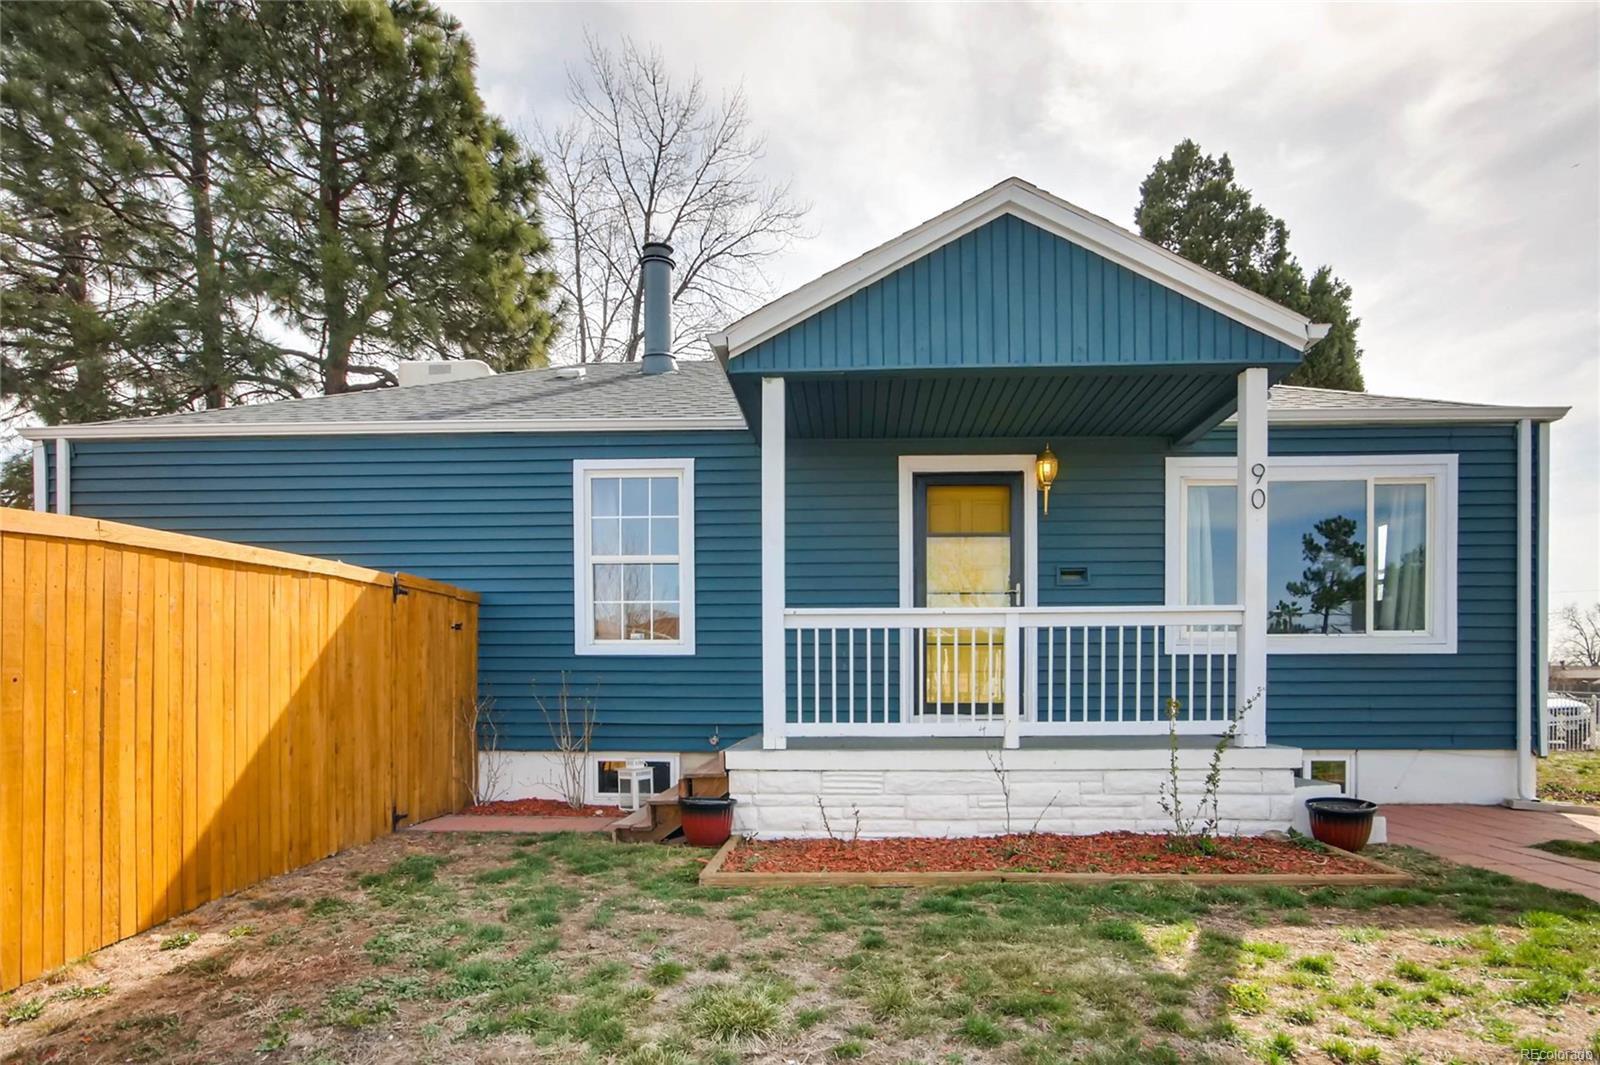 90 S Decatur St, Denver, CO 80219 - Recently Sold | Trulia